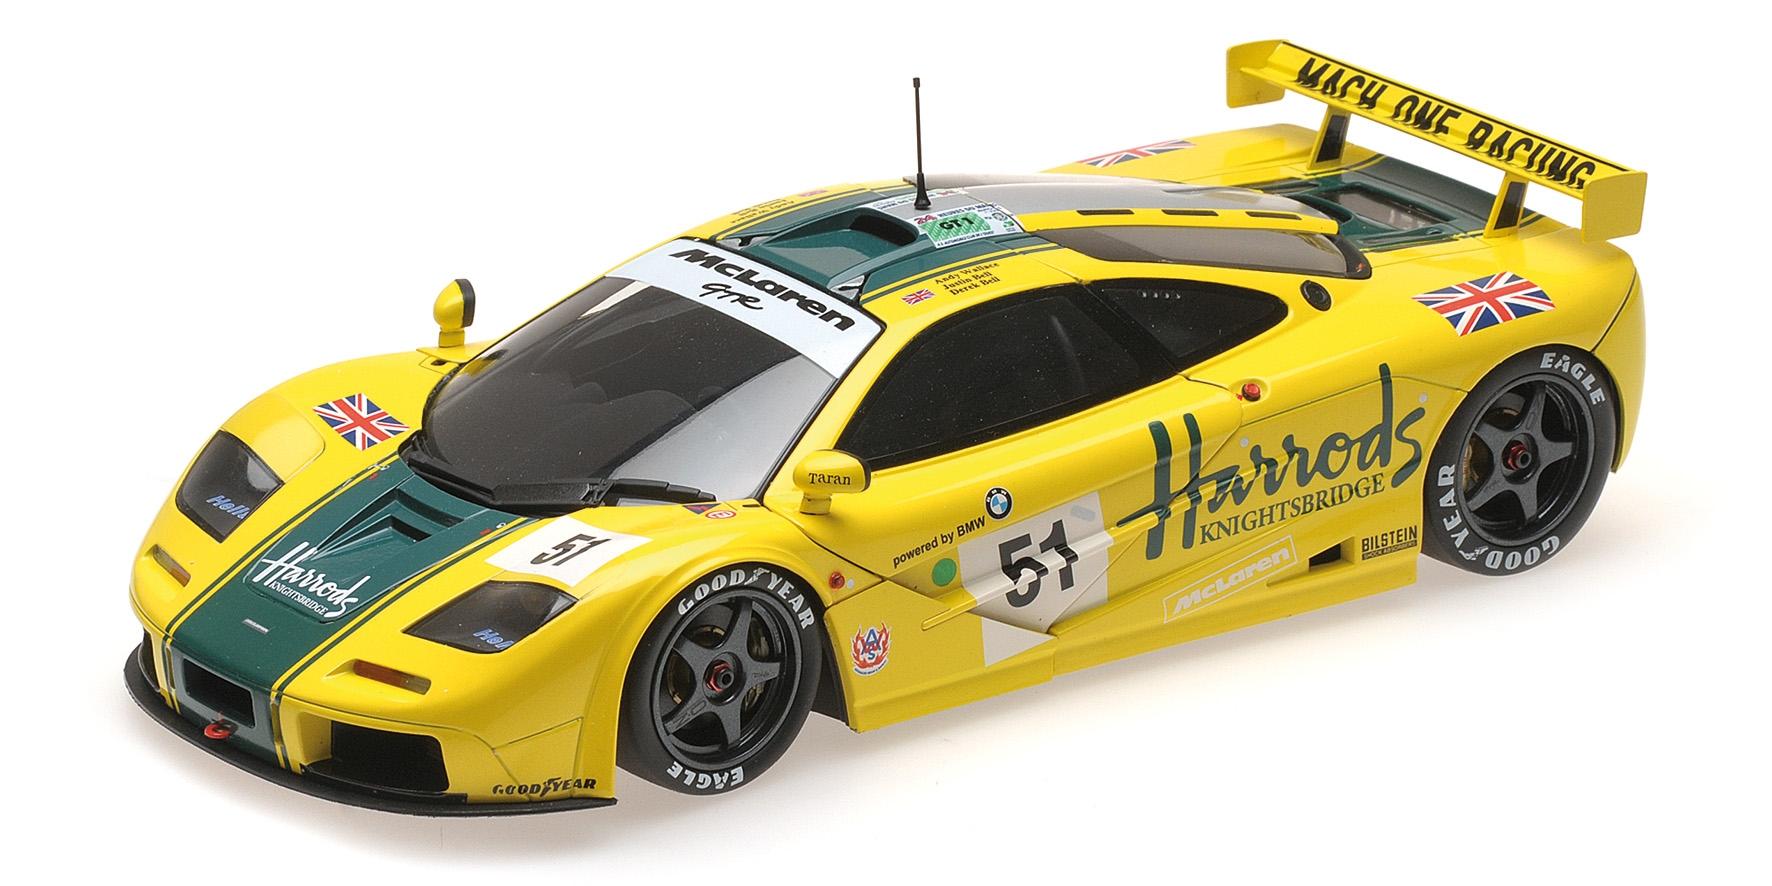 McLAREN F1 GTR HARRODS MACH ONE RACING WALLACE BELL 24H LE MANS 1995 Minichamps